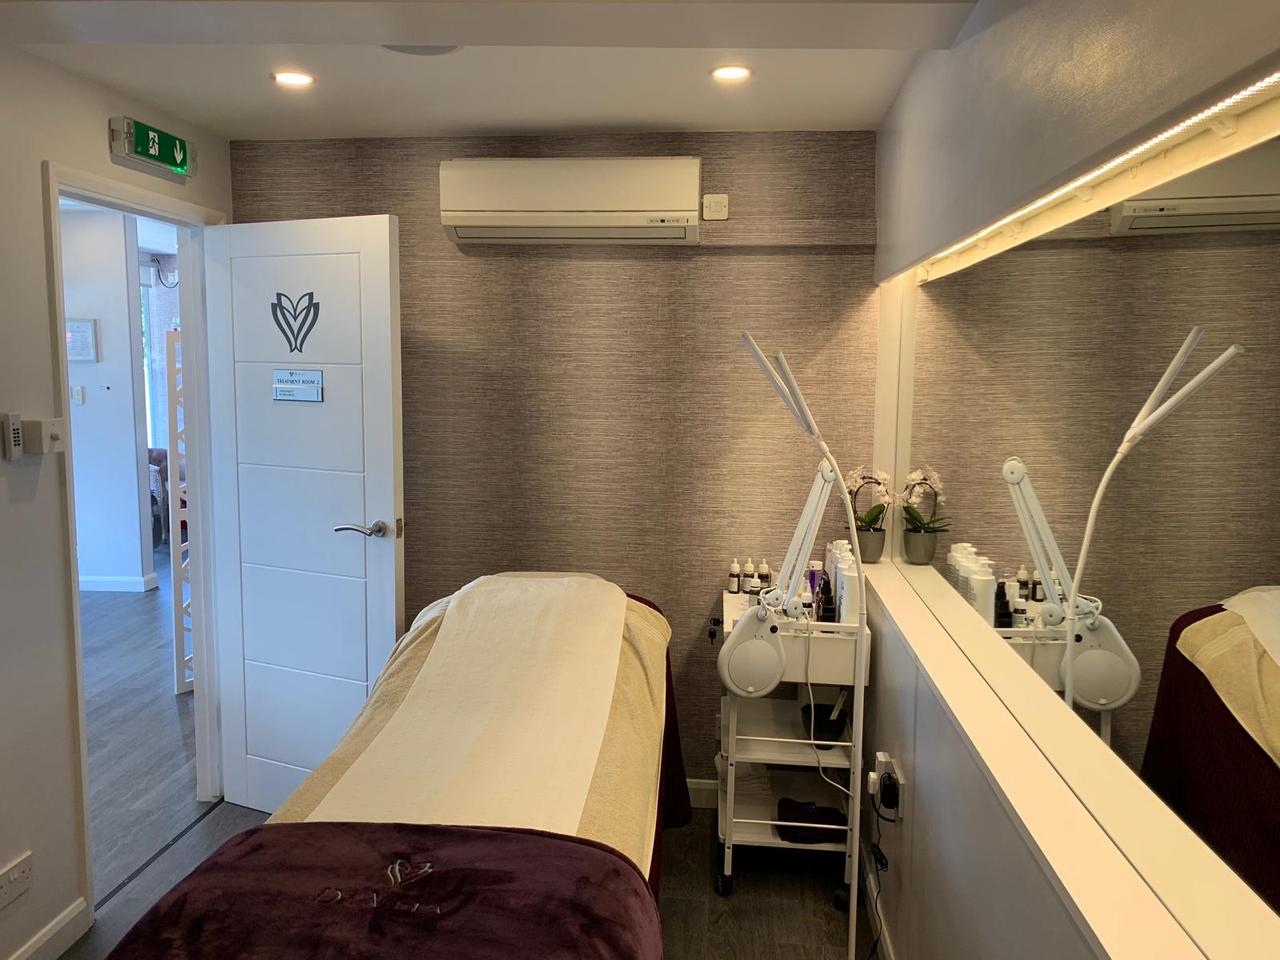 DeVita Beauty & Aesthetics - My Story - Treatment Room 1